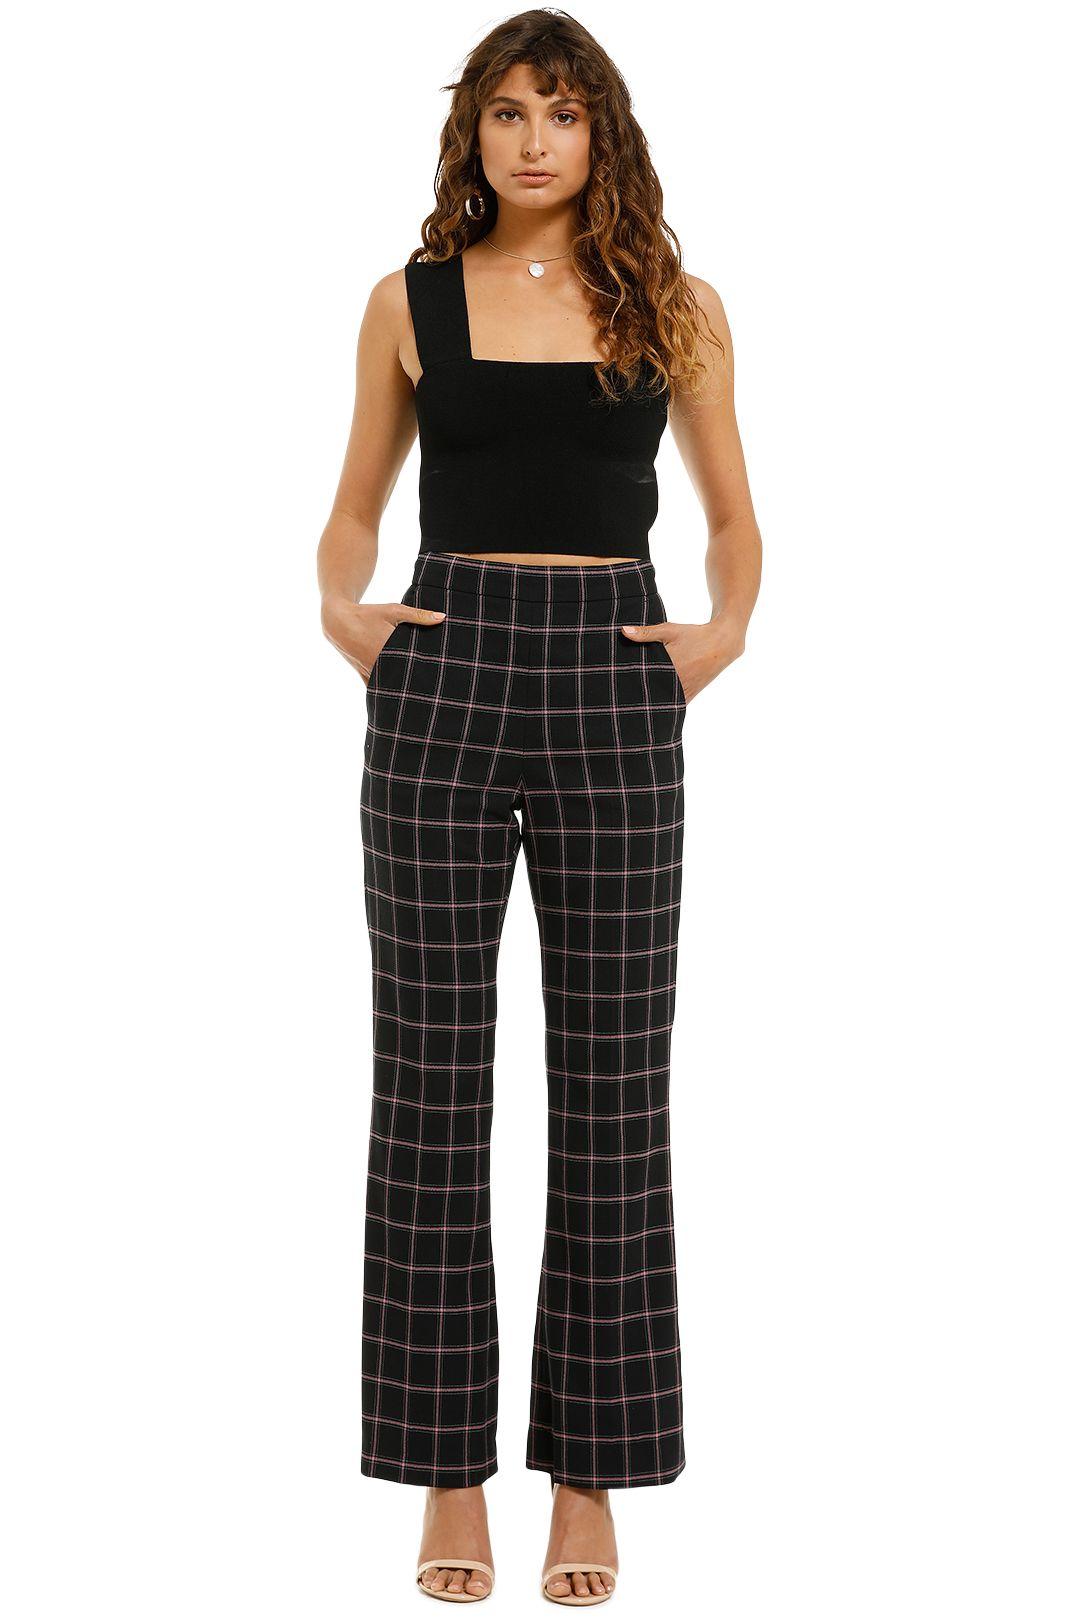 Rebecca-Vallance-Peta-Pants-Black-Check-Front